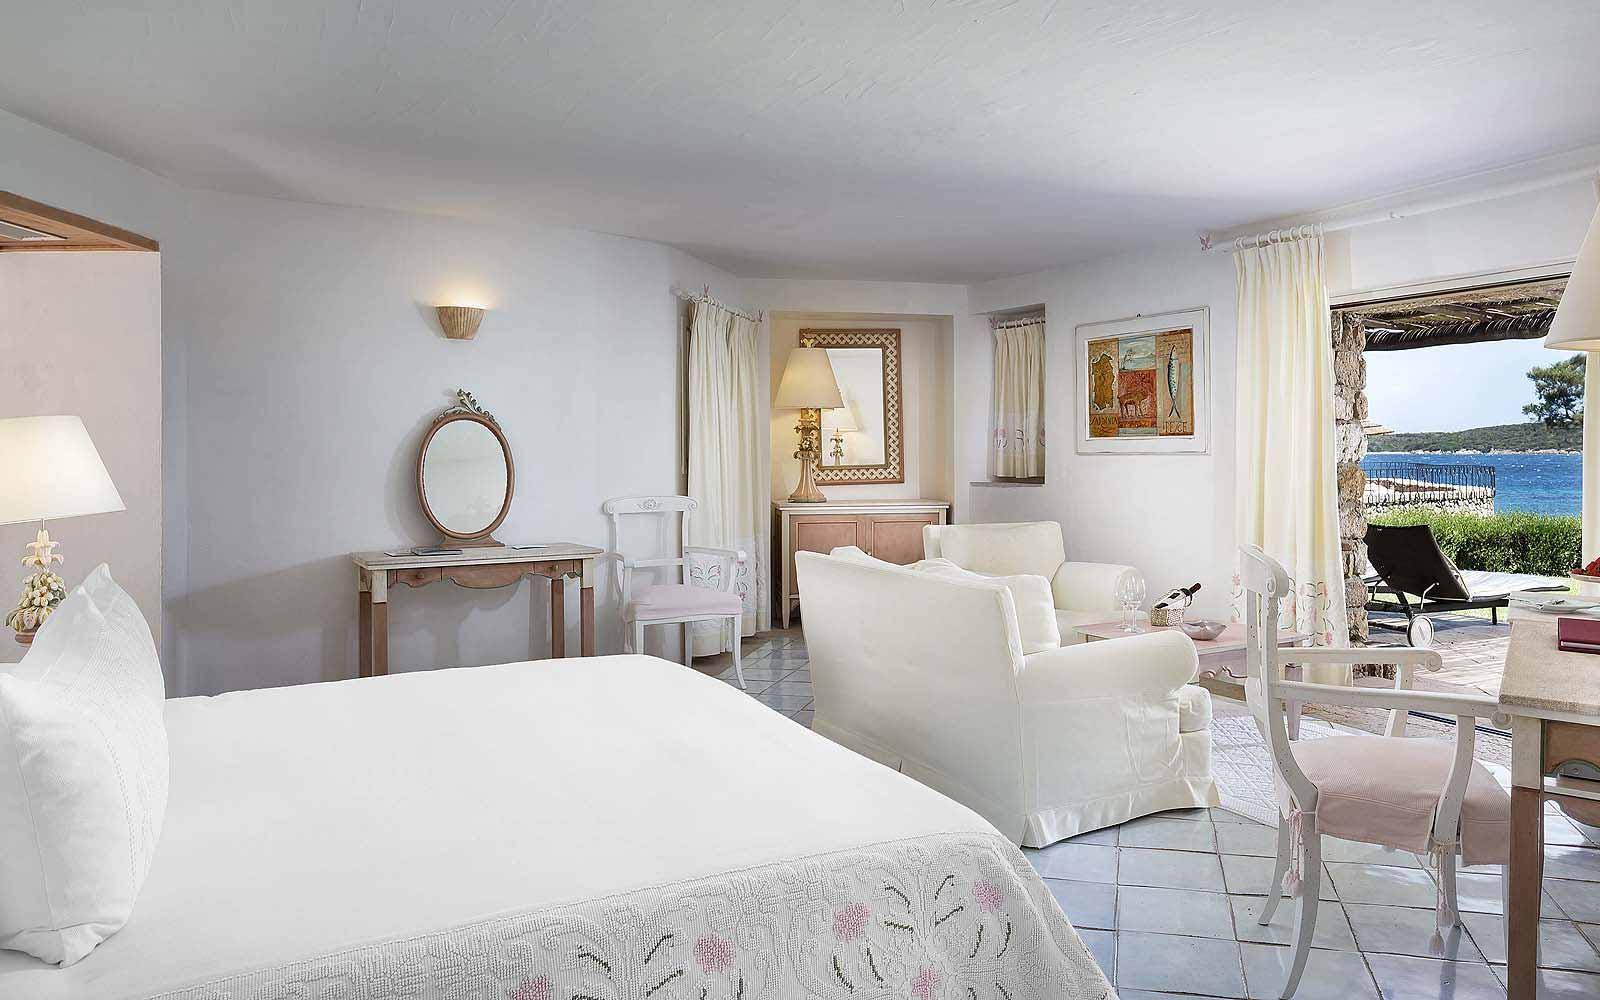 A Premium Room at the Hotel Pitrizza